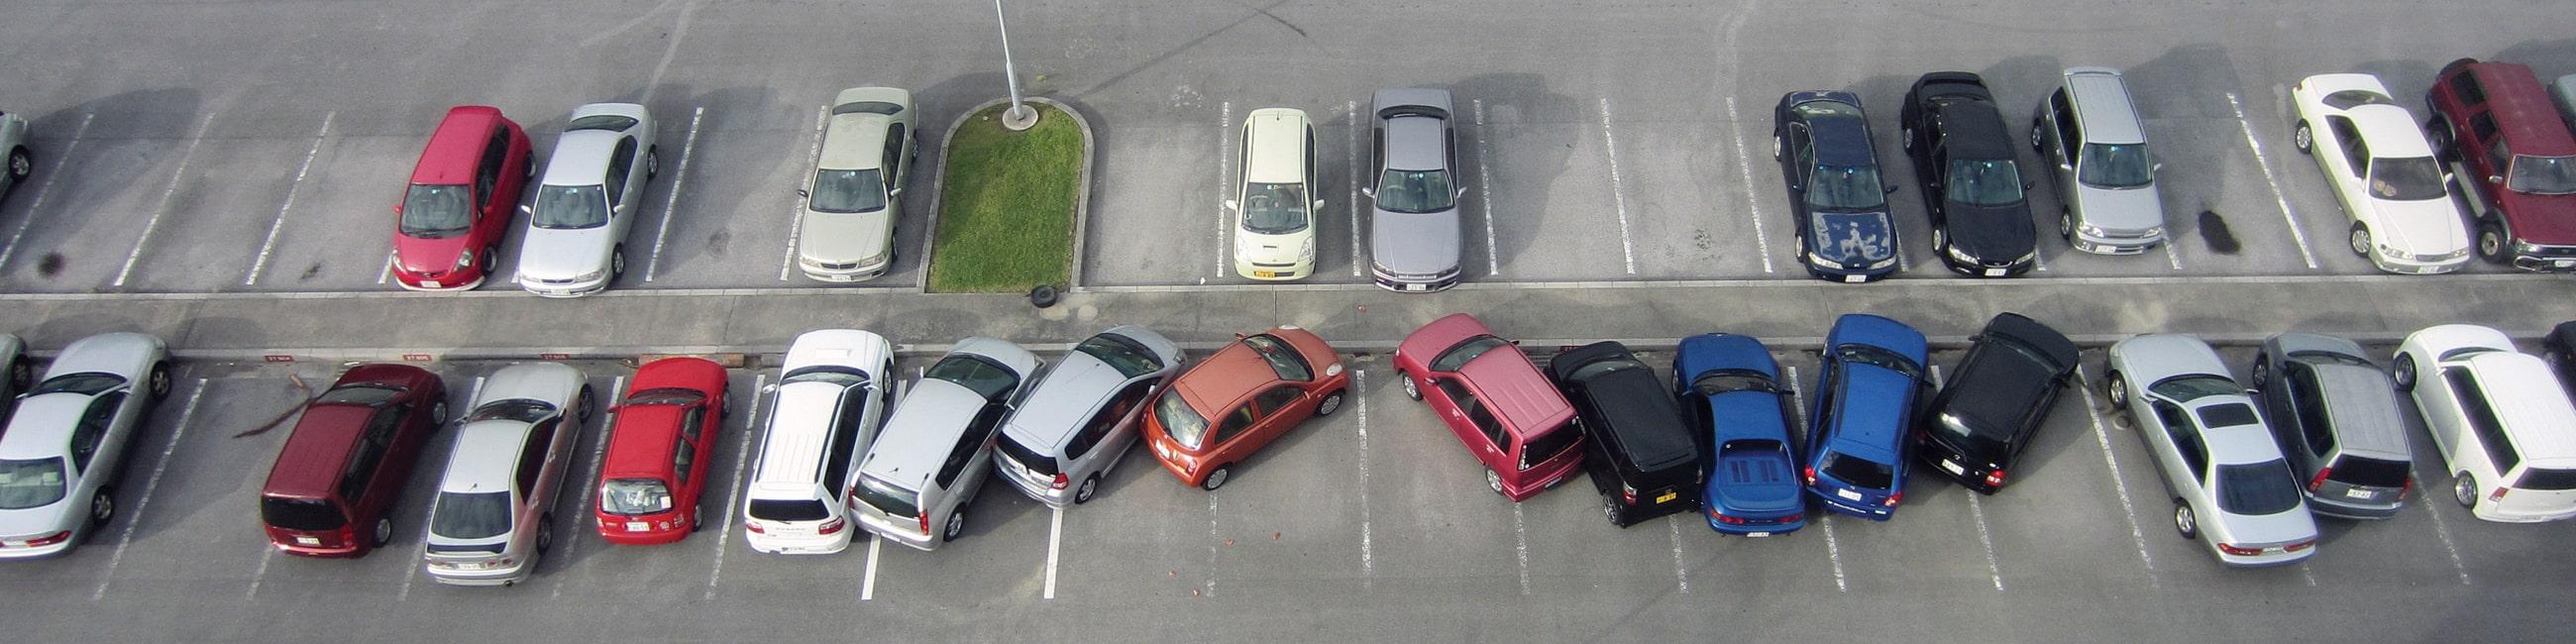 Higher Fines for Bad Parking